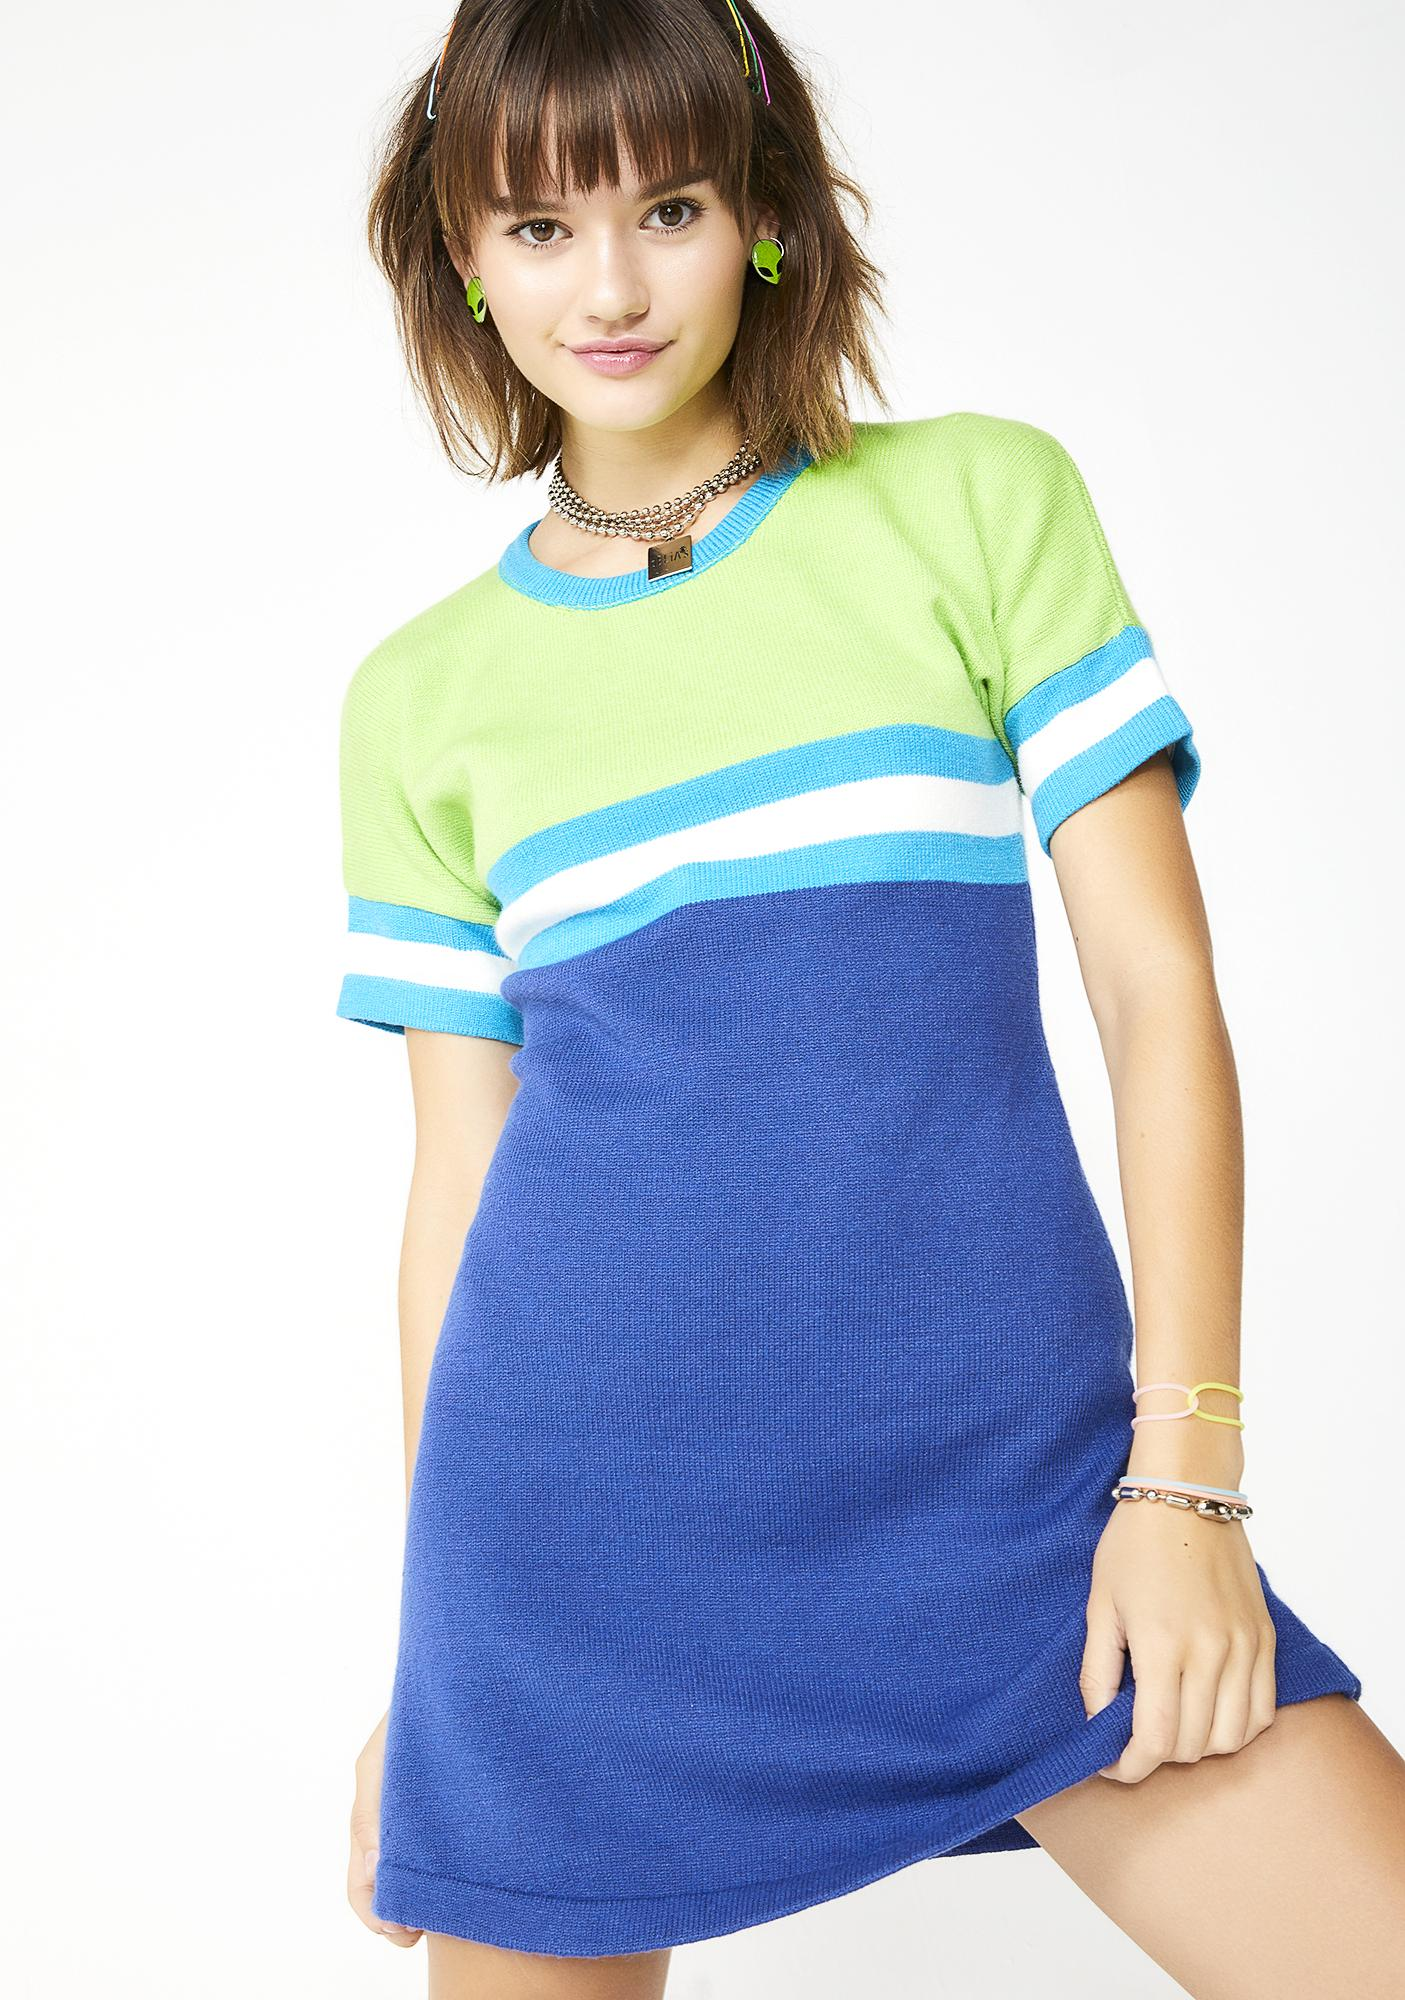 Elemental Like H2 O Sweater Dress by D E Li As By Dolls Kill